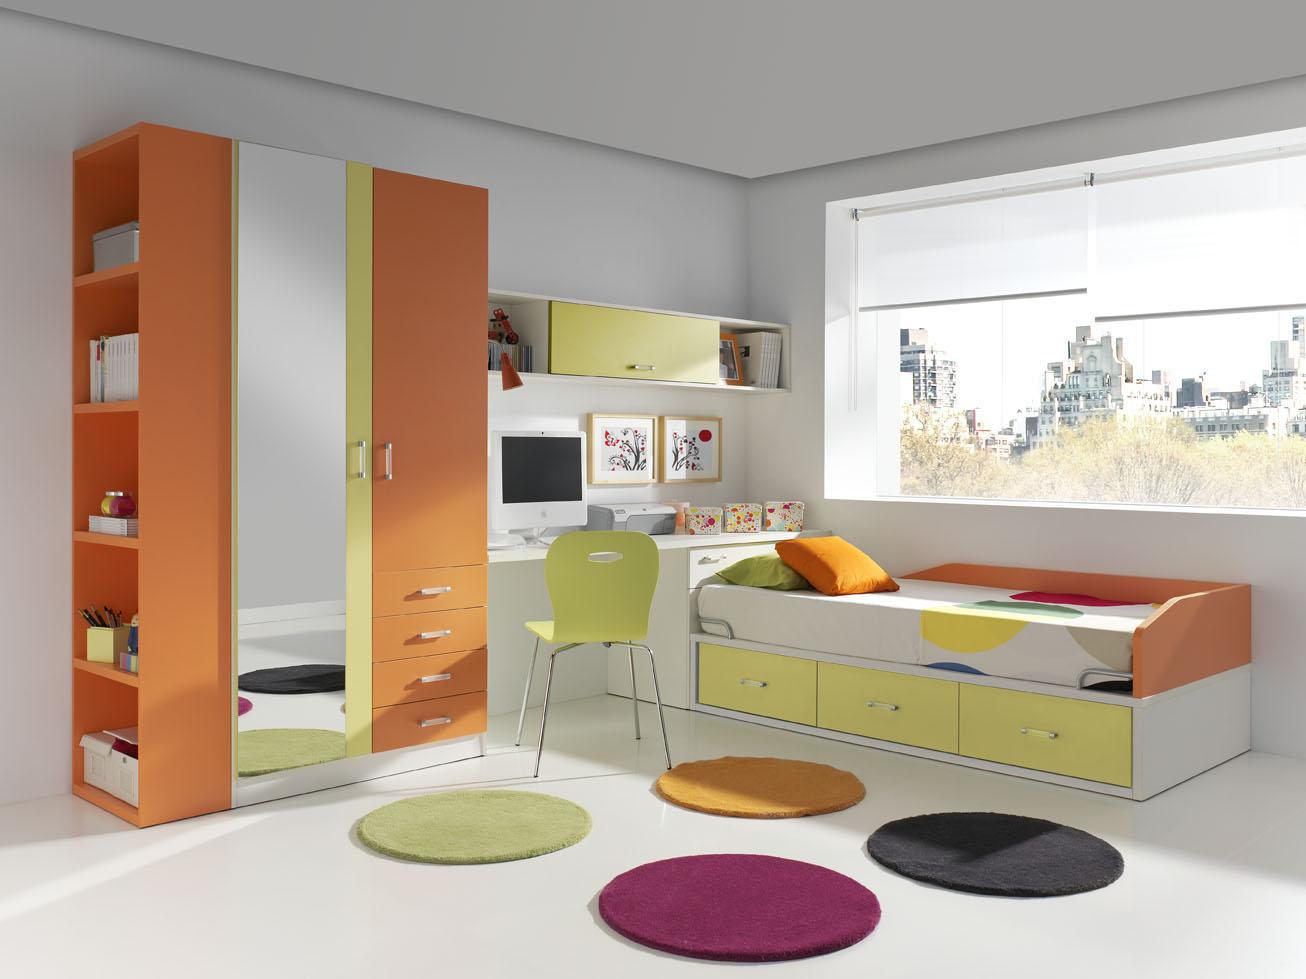 La calidad un factor de decisi n muebles orts blog for Muebles para habitaciones juveniles